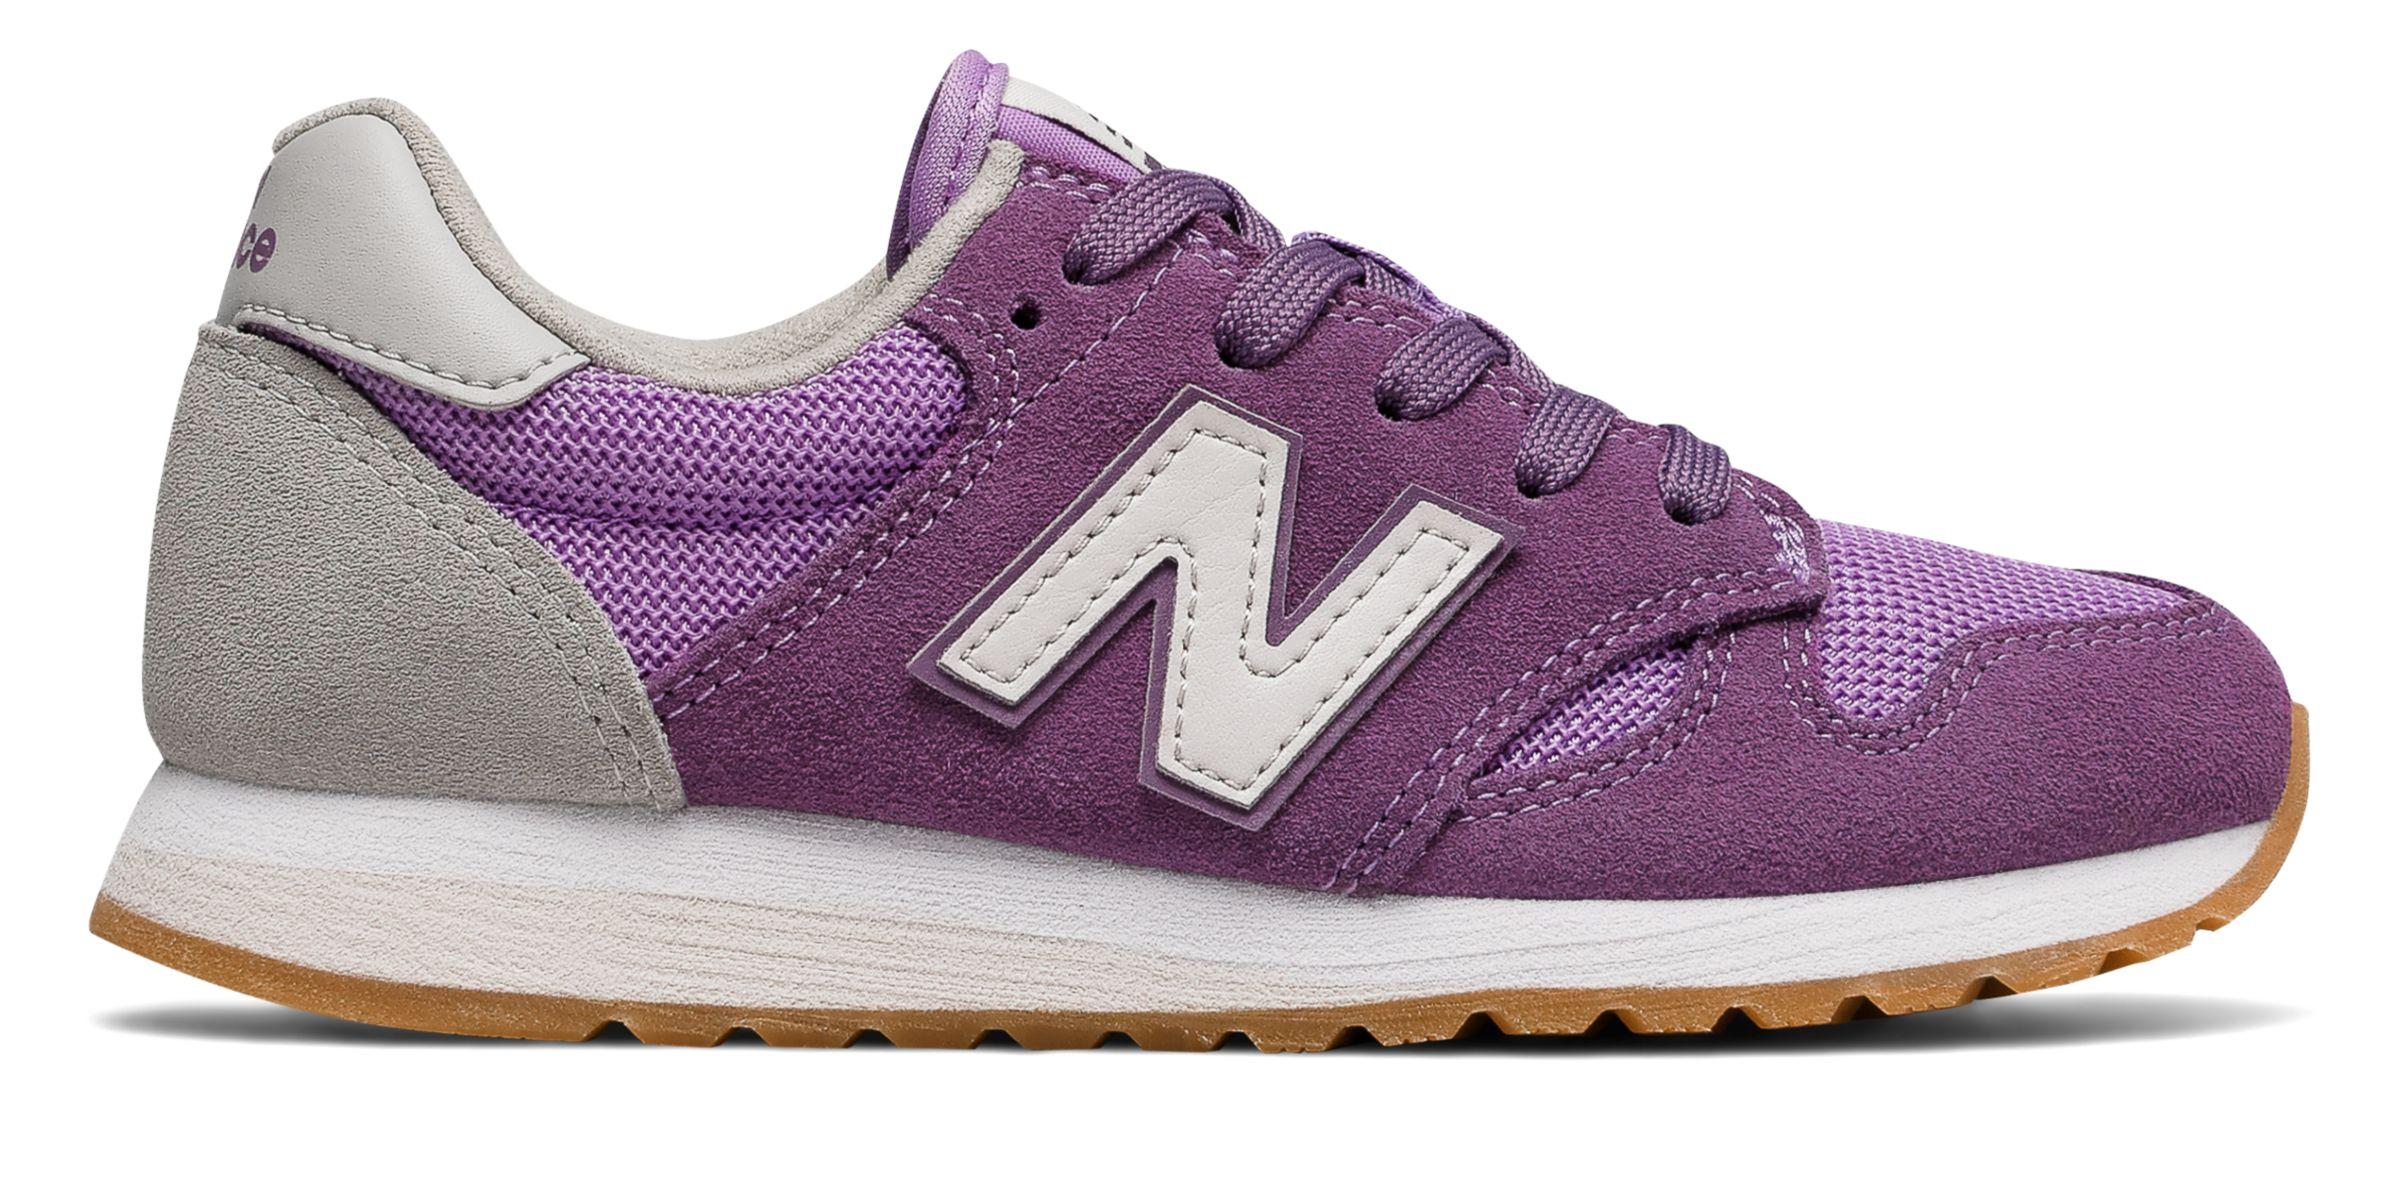 NB 520 New Balance, Purple with White